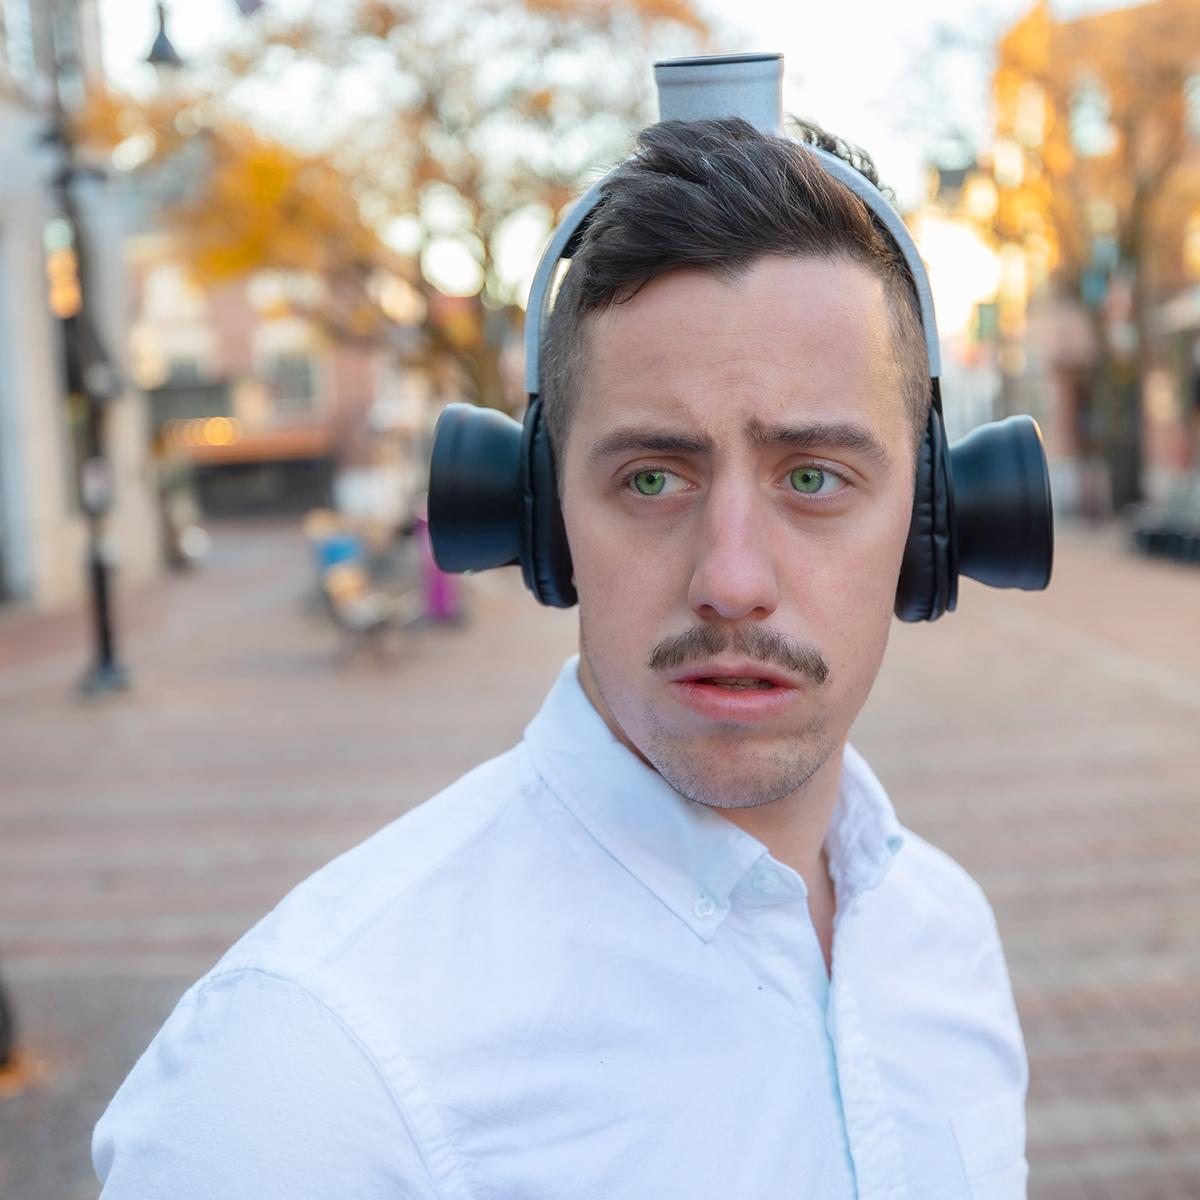 ReversePhones - Unnecessary Inventions